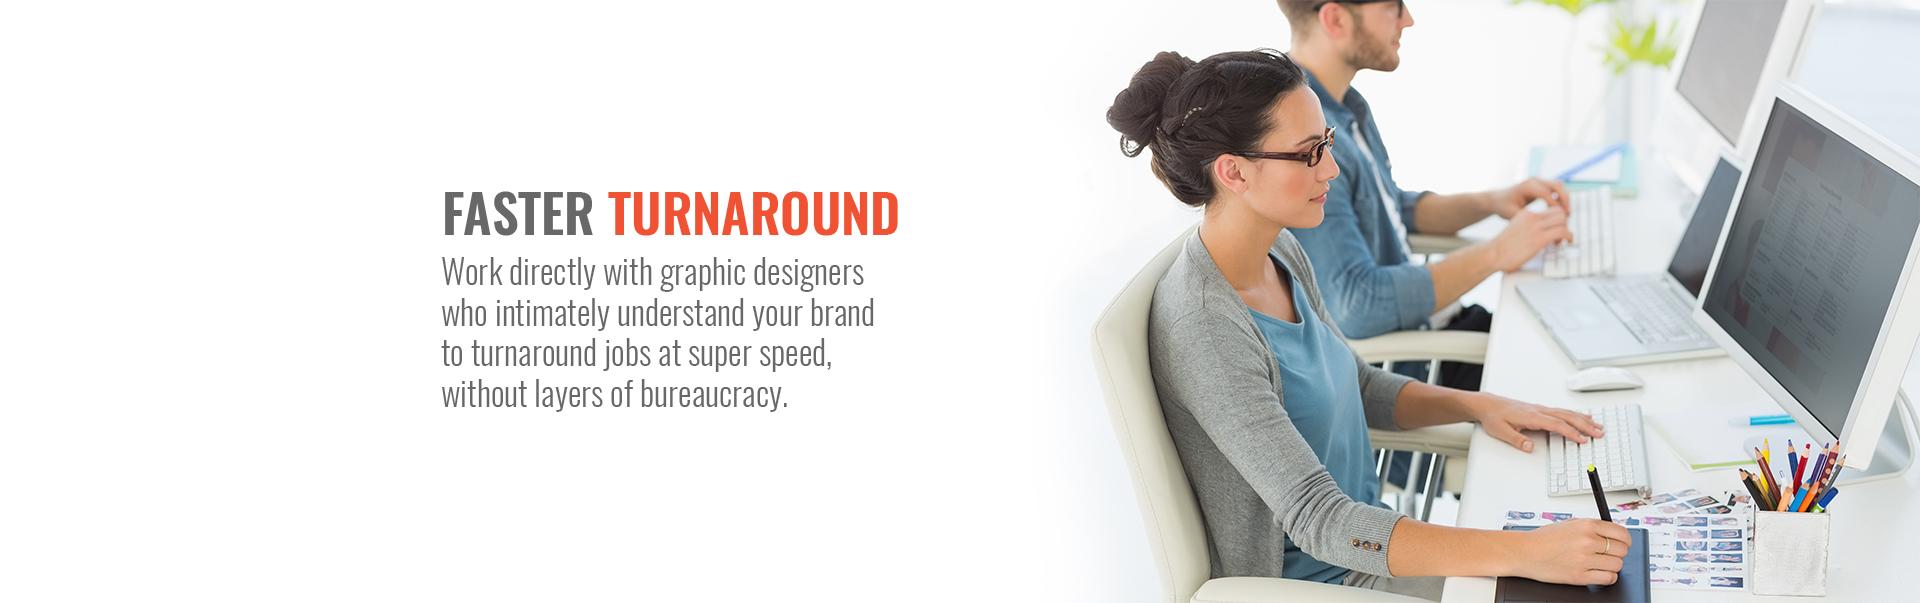 TURNAROUND-182861645